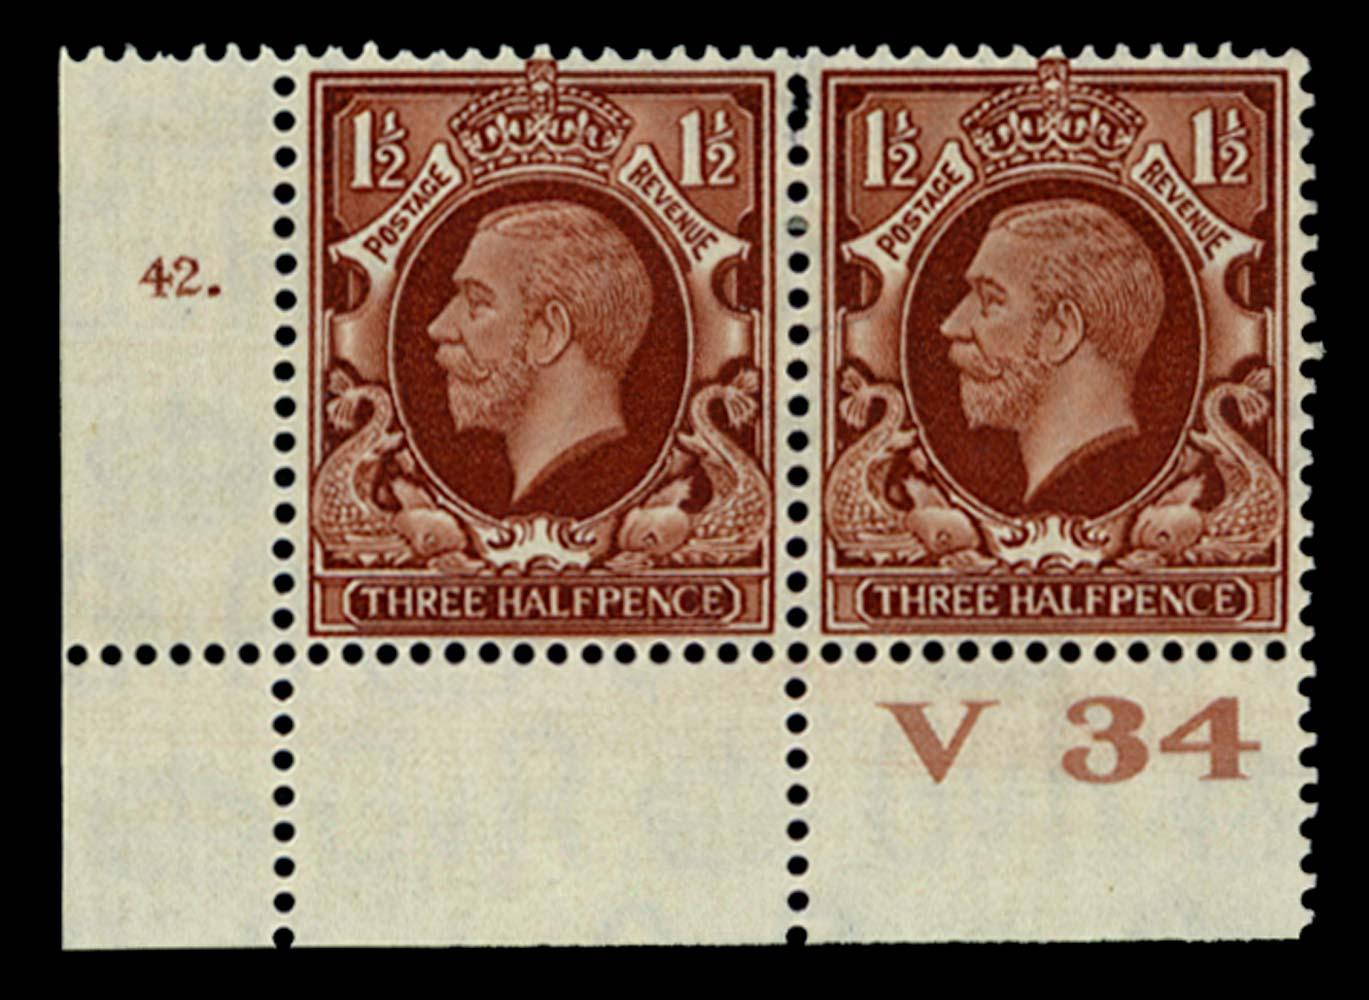 GB 1934  SG441 Mint Control V34, Cyl. 42 (Dot)